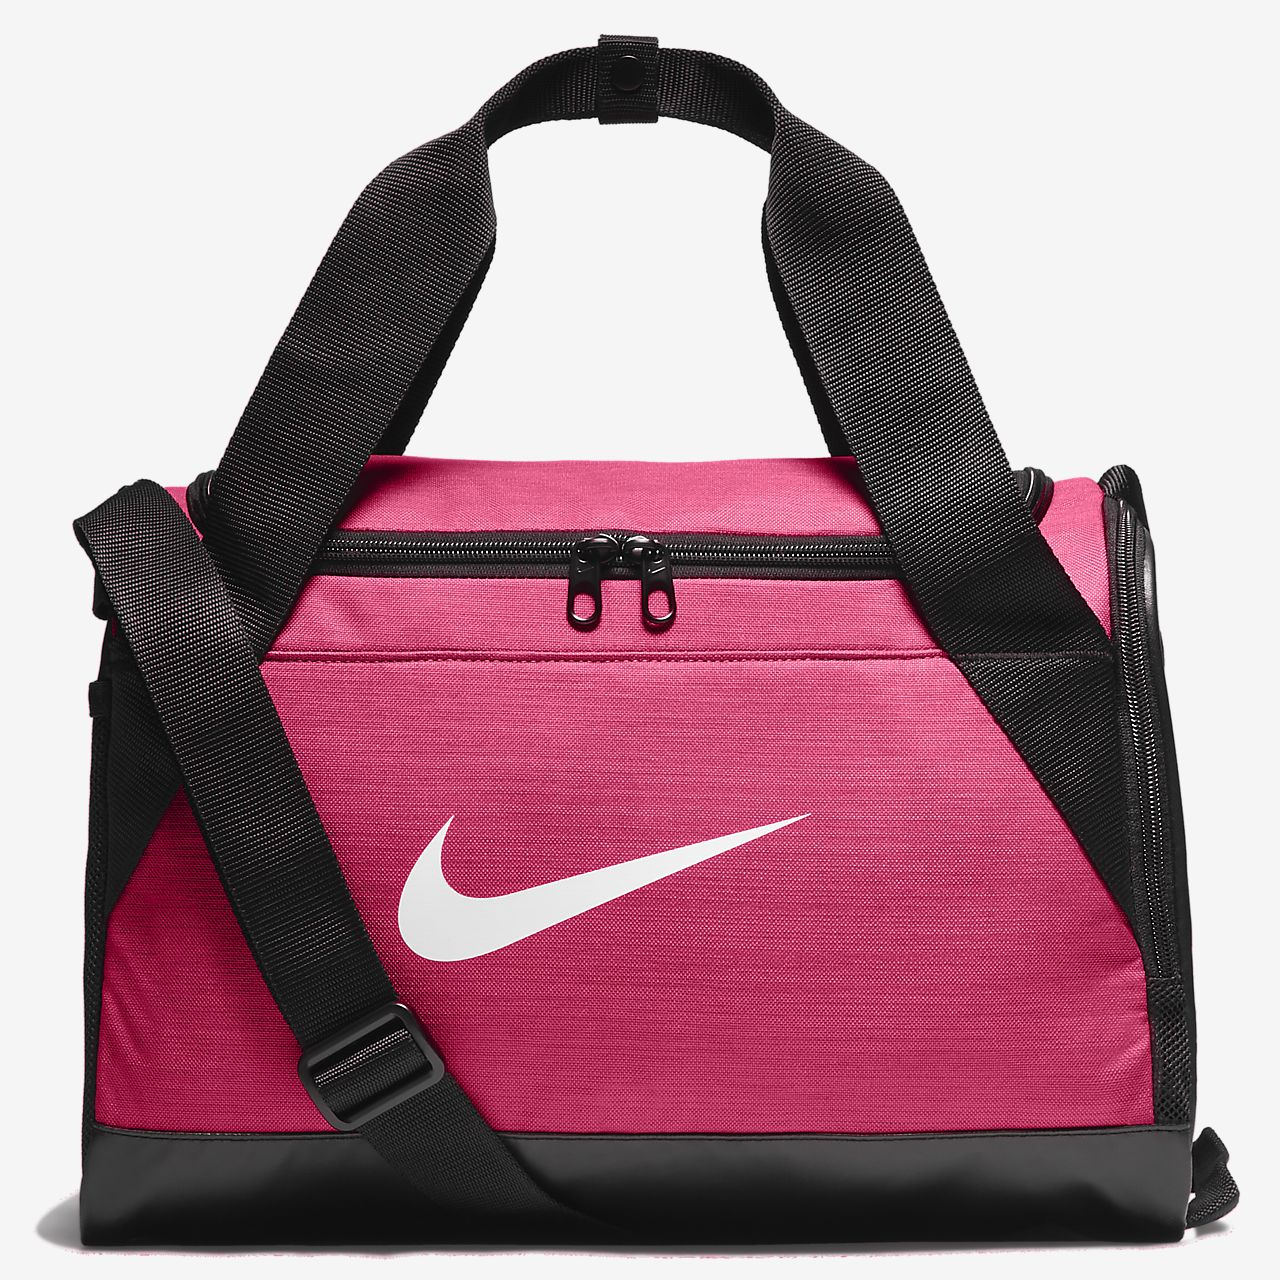 De Taille Sac Sport Training Nike Brasiliatrès Petite 29IYHEDW